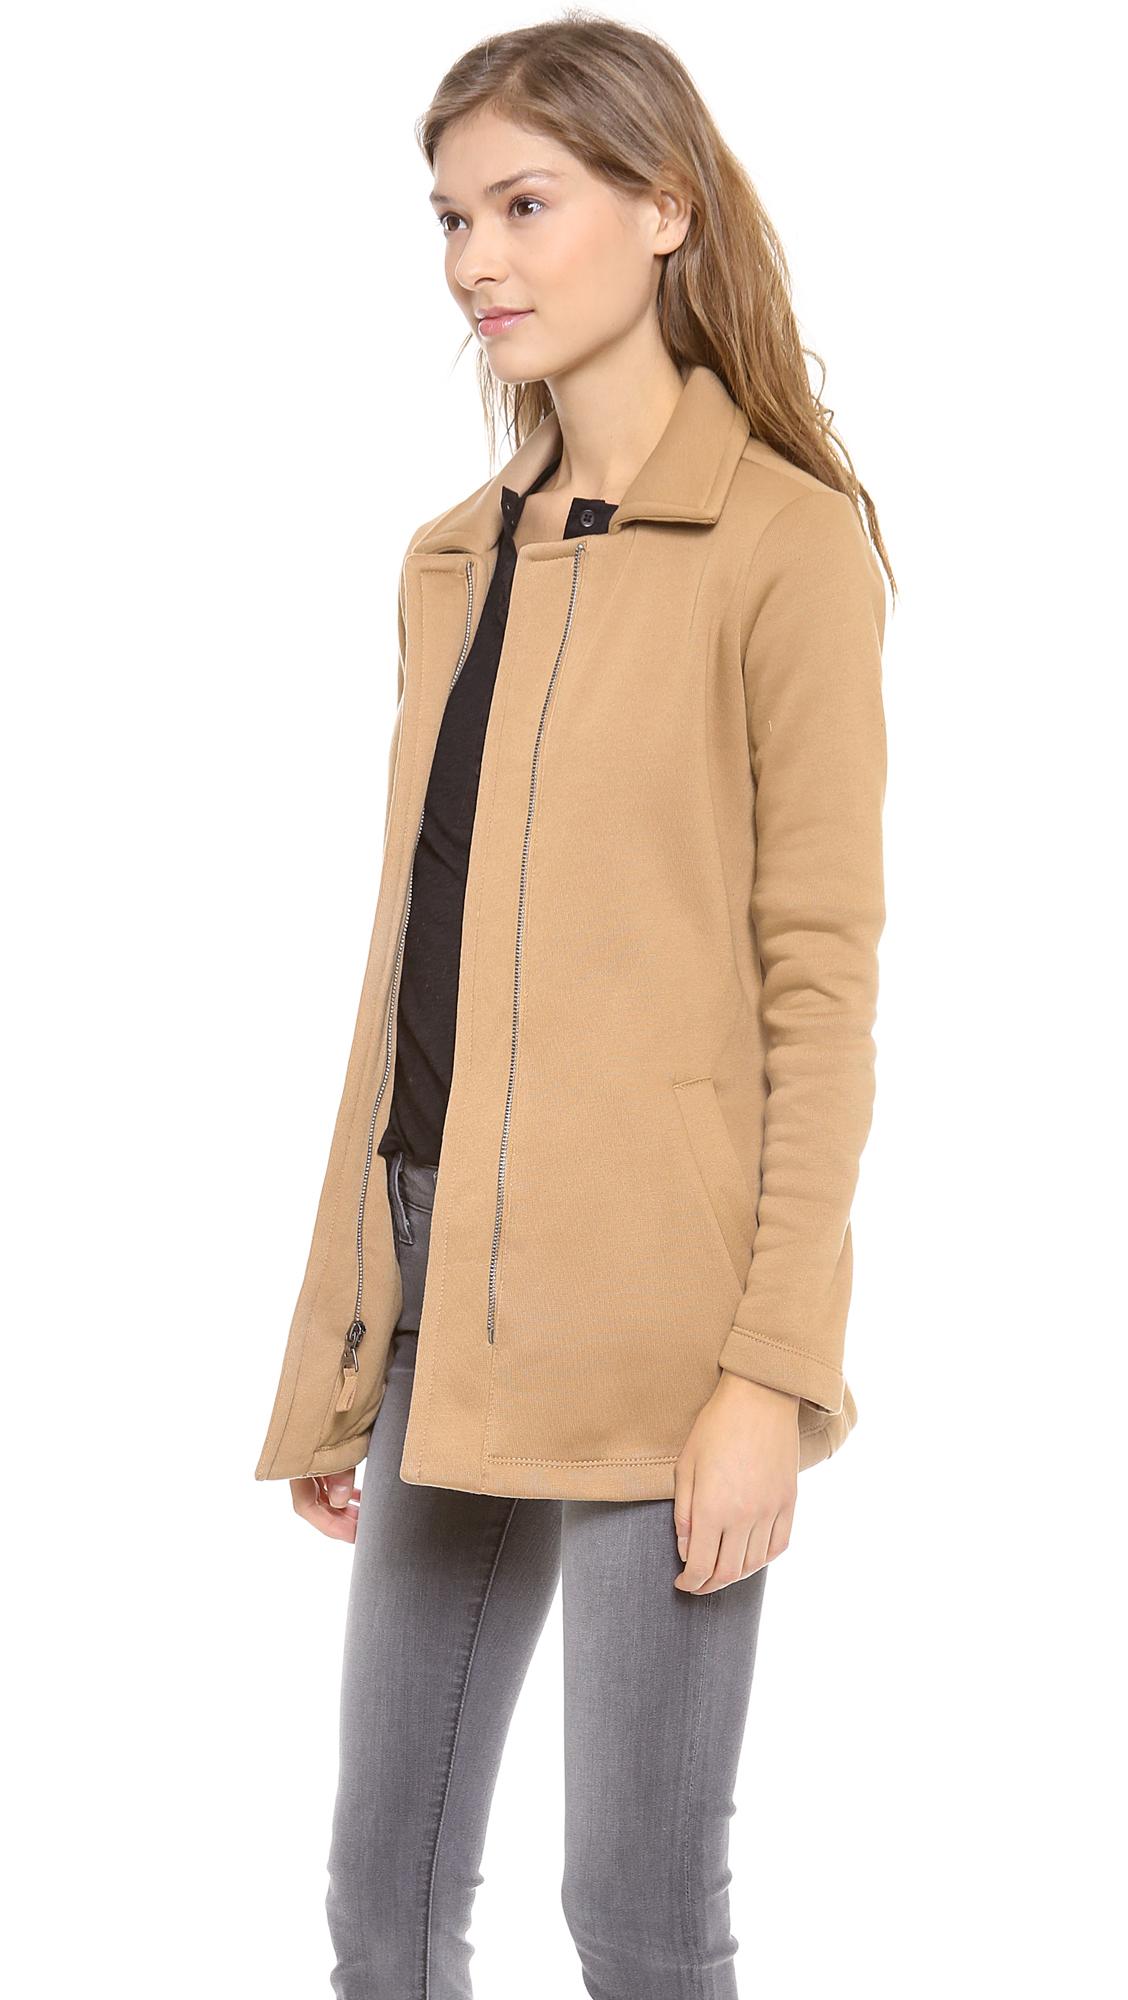 Splendid Seneca Fleece Car Coat in Natural | Lyst